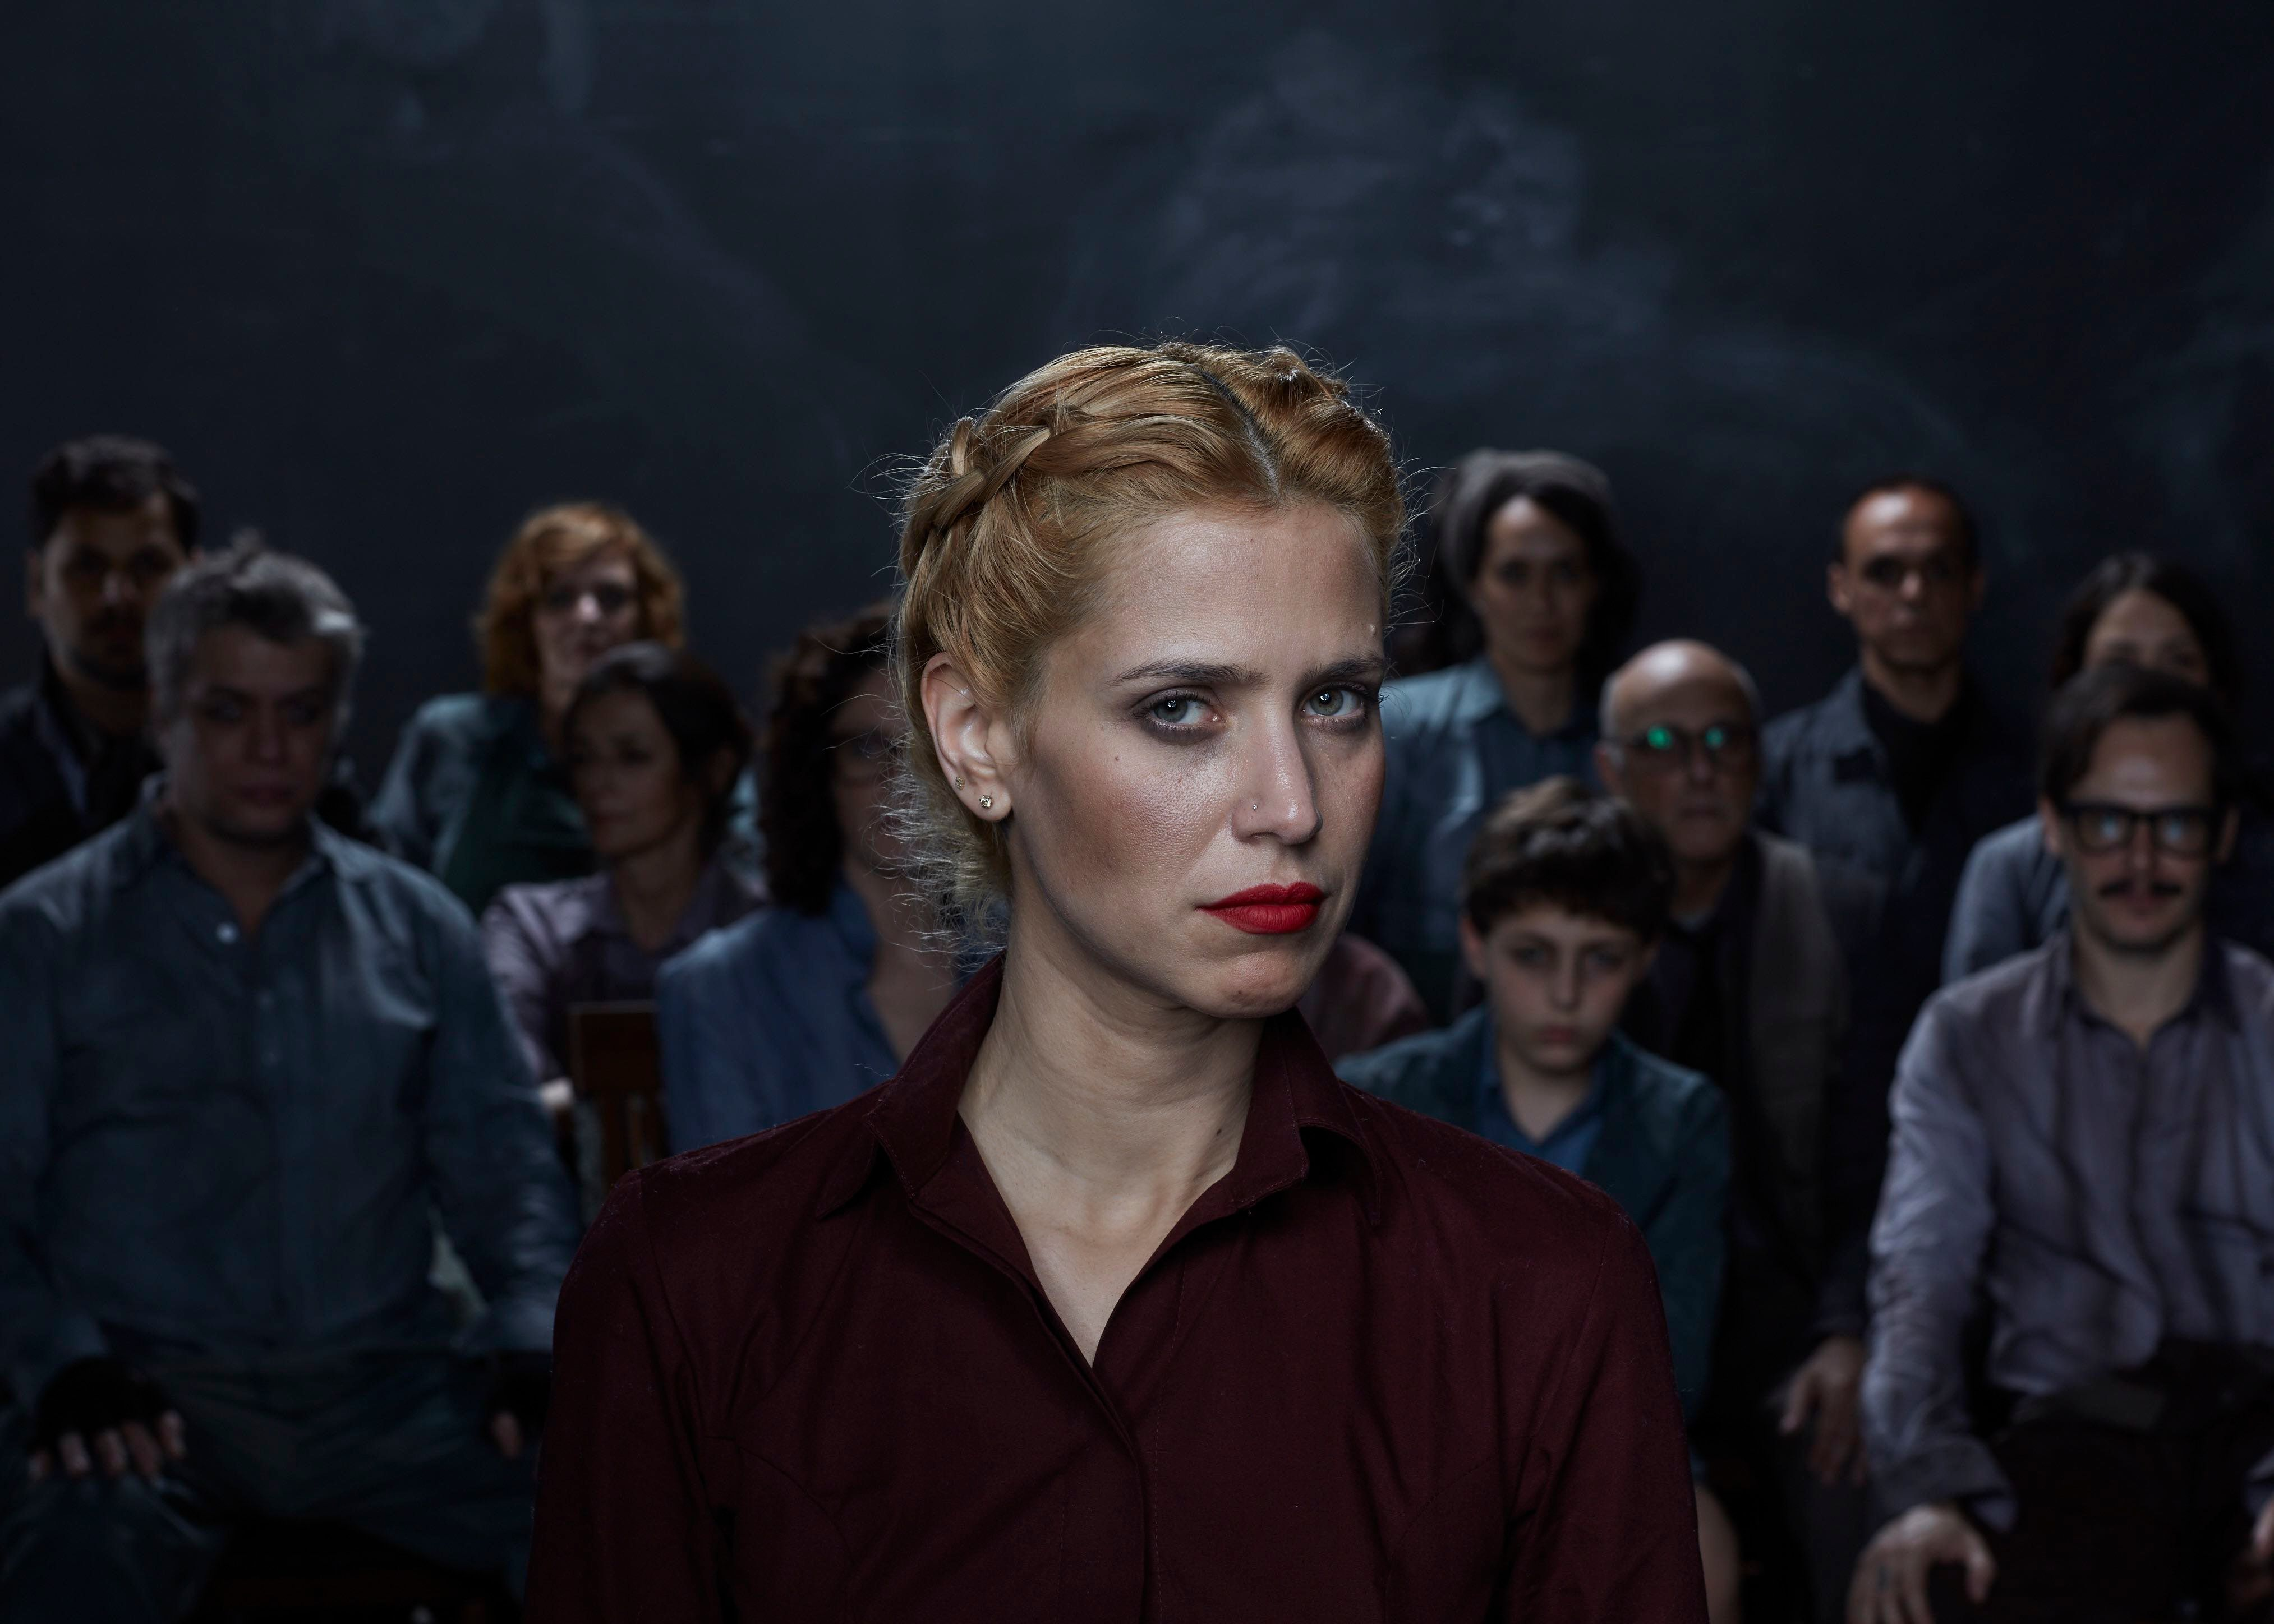 Mel Lisboa sobre estreia de 'Dogville': 'Provocar é importante neste